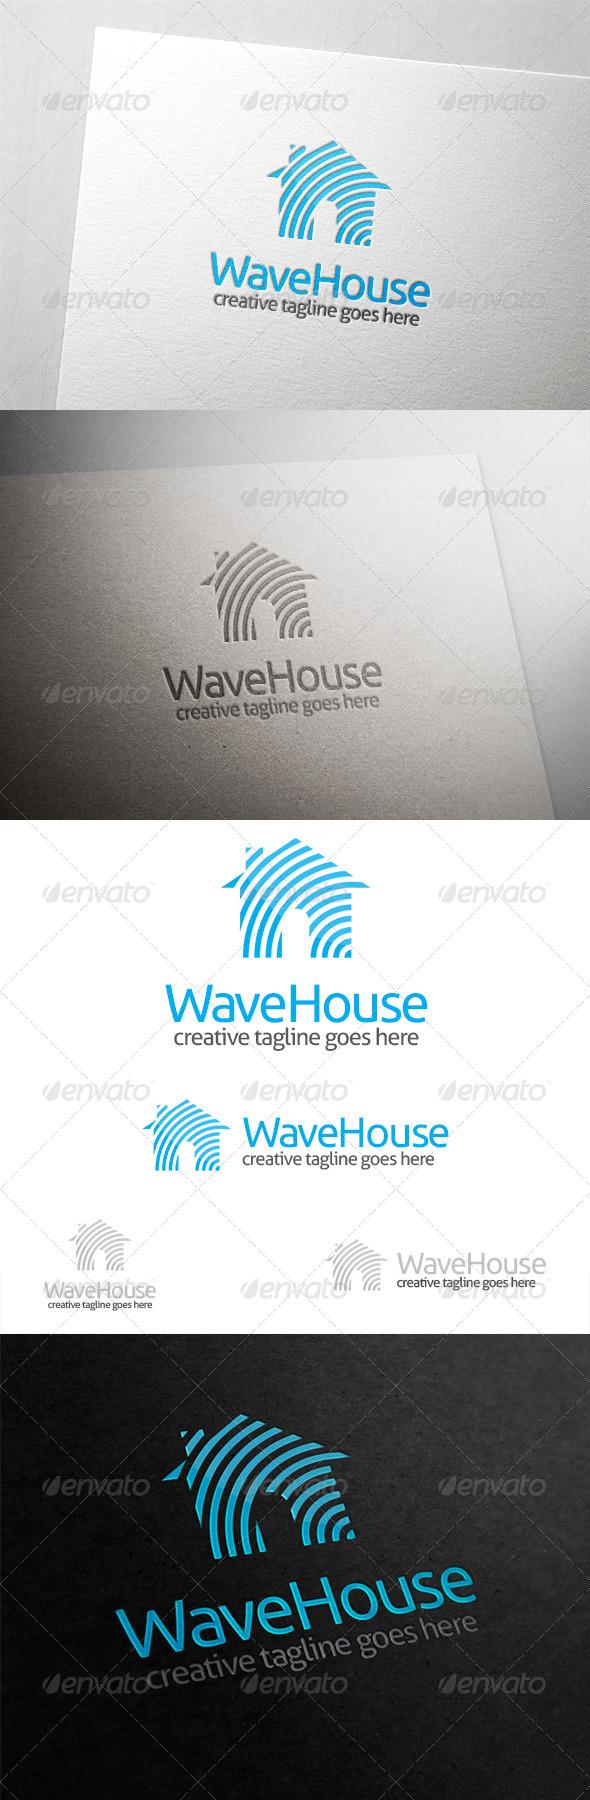 GraphicRiver Wave House Logo 6428660